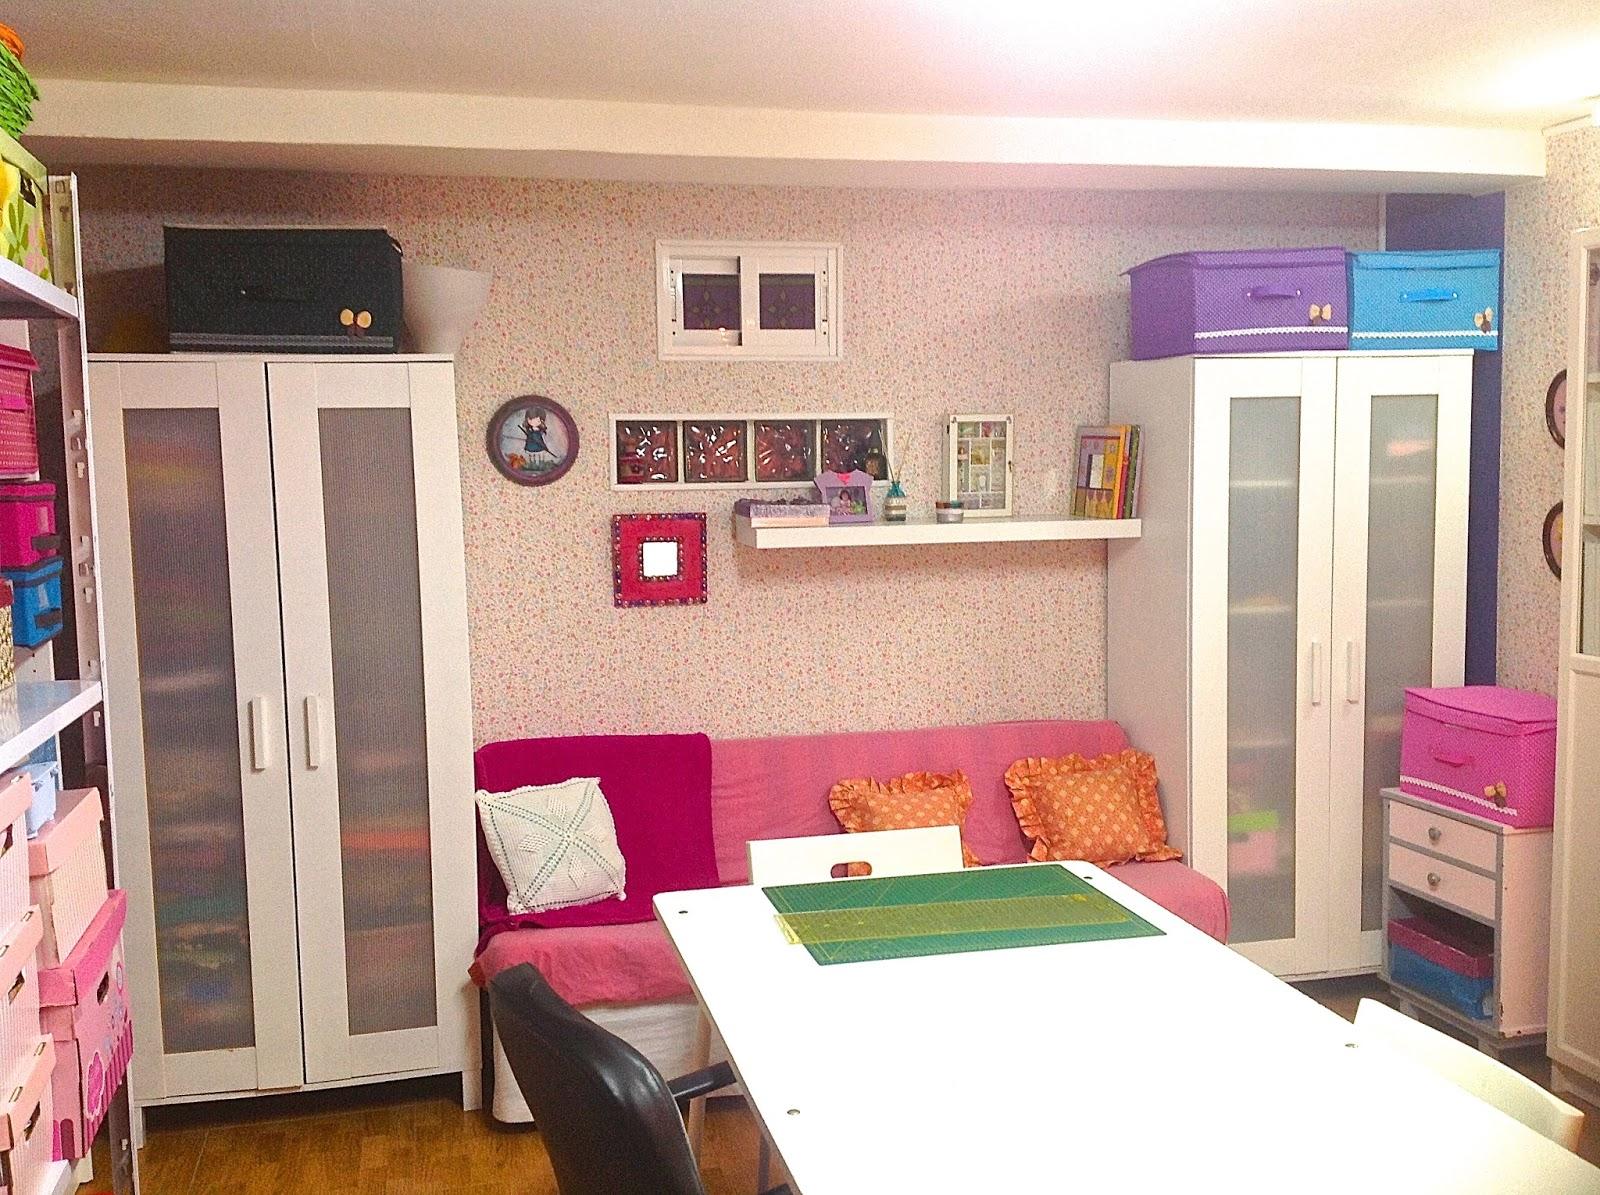 Mueble Para Frigorifico Ikea. Mueble Para Tv With Mueble Para ...